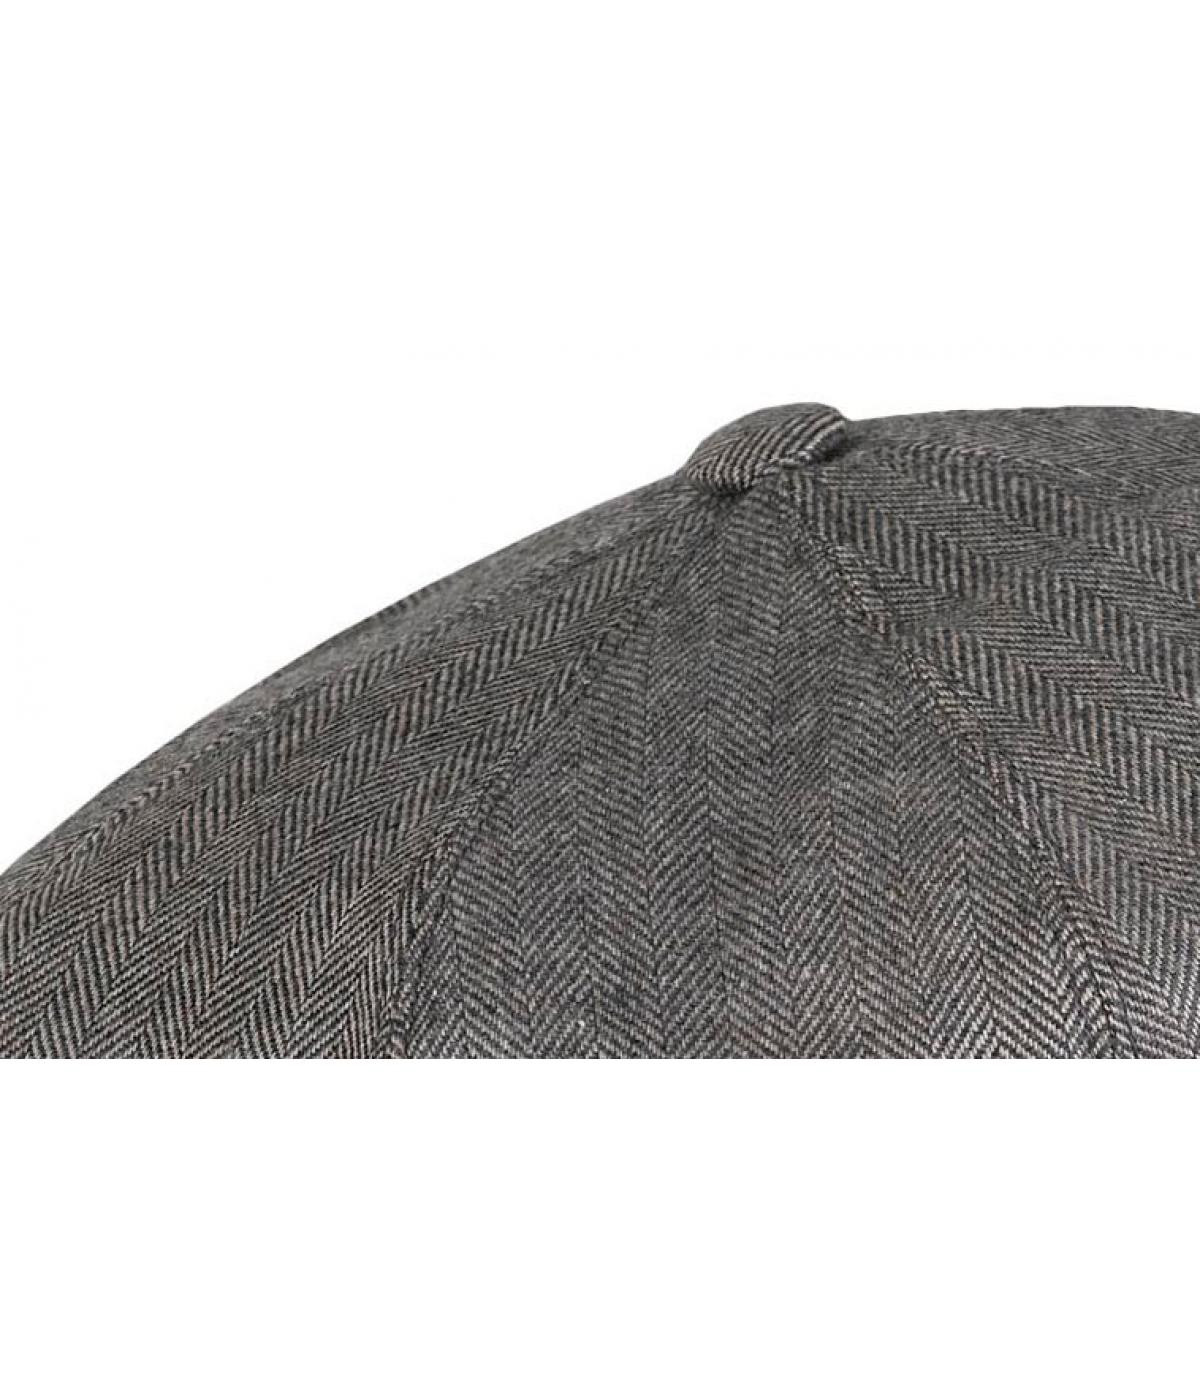 Détails Hatteras Wool Cashmere Silk grey - image 3